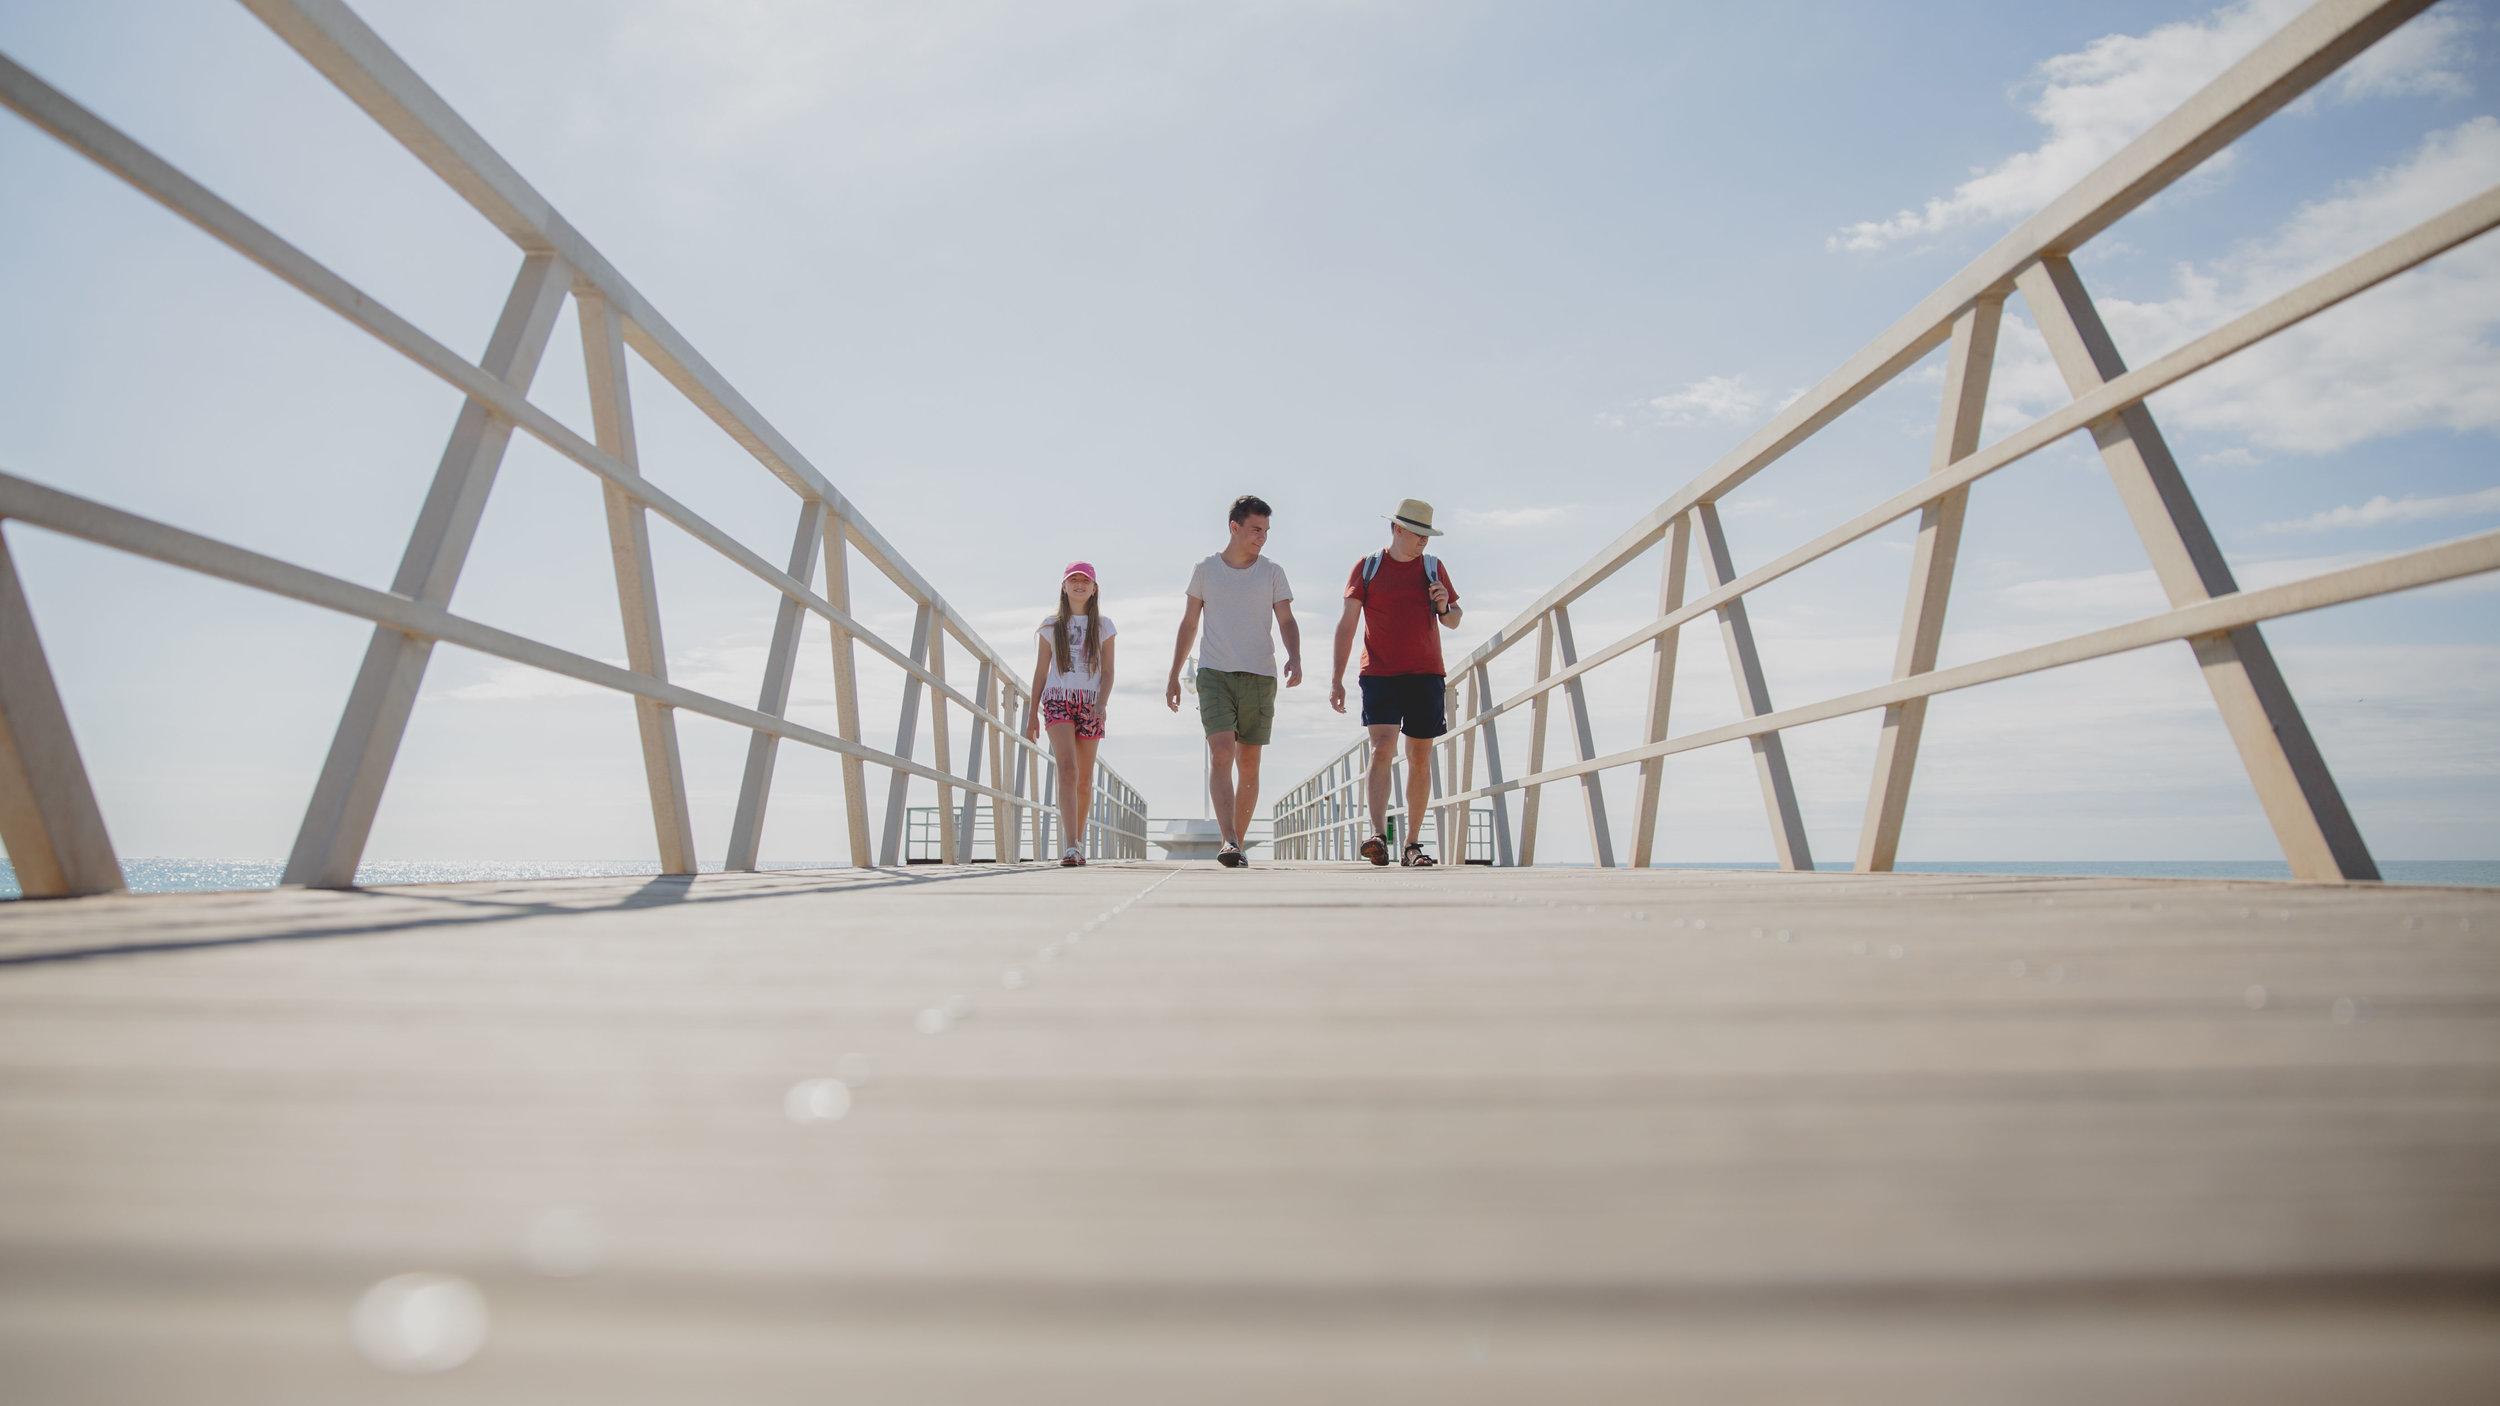 Spain-Valencia-holidays-travelling-travel-beach-sun-summer-family-natalia-smith-photography-2.jpg